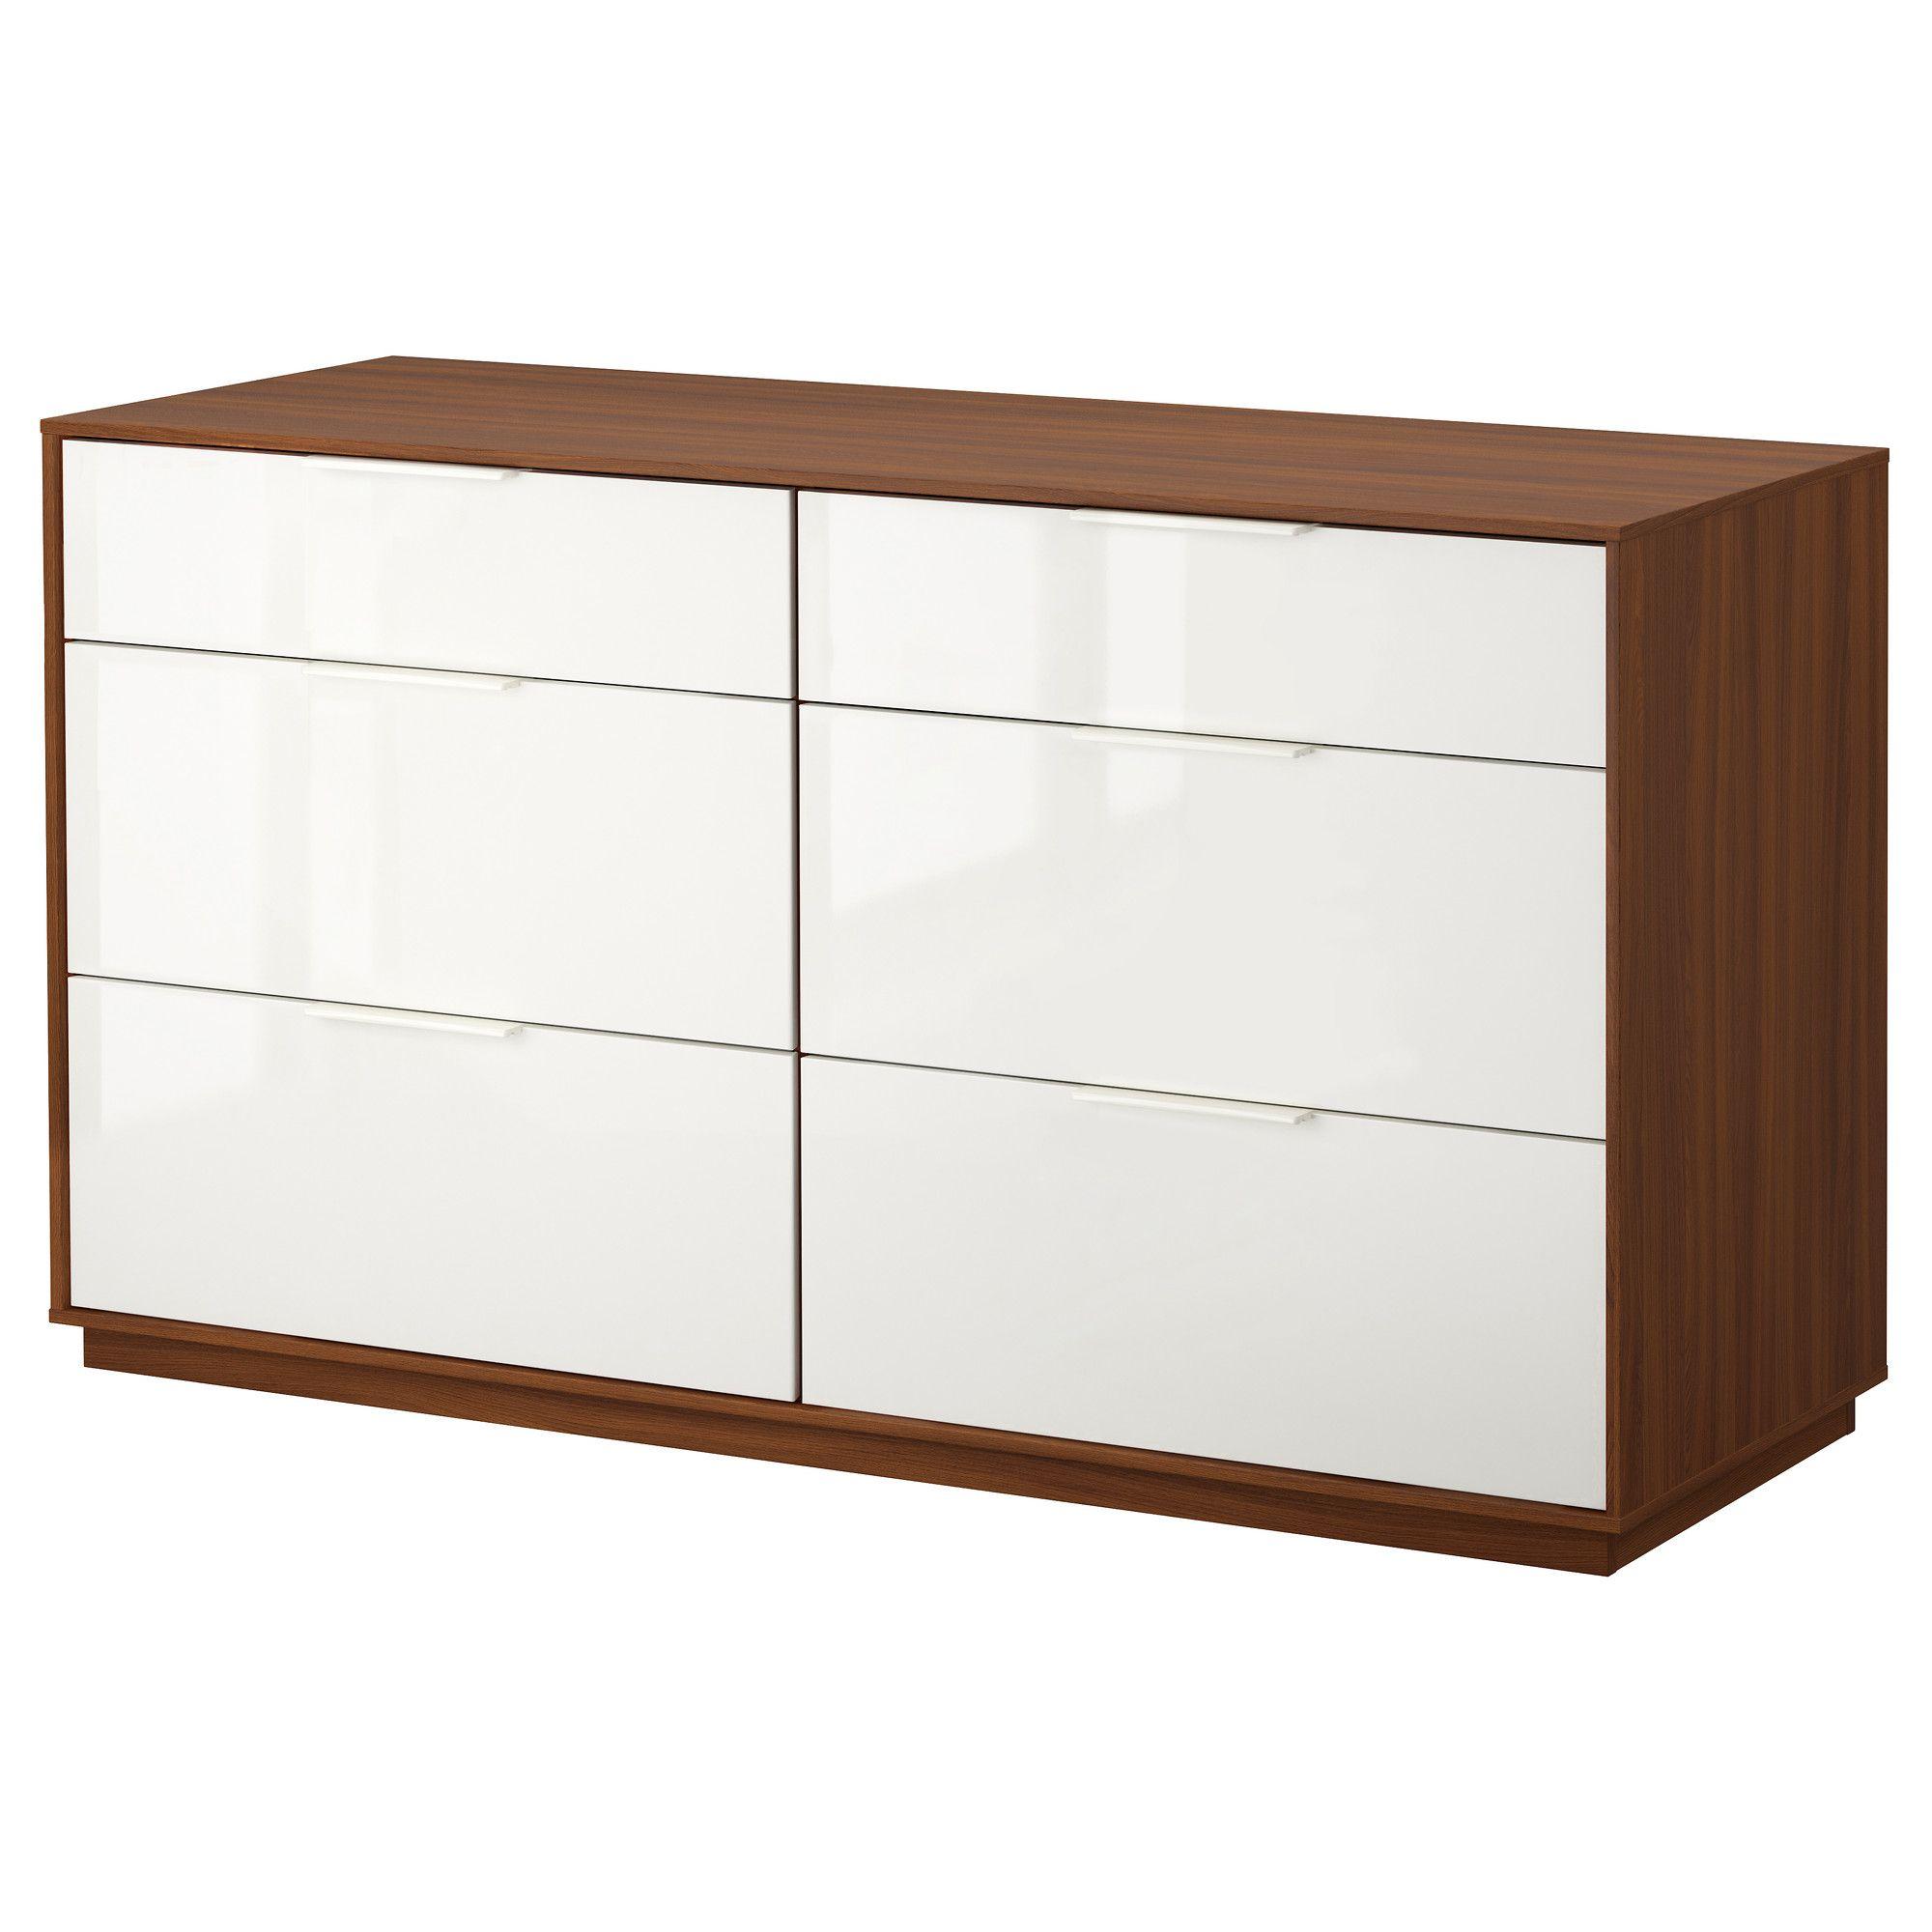 Ikea Ikea Stenstorp Wood Chrome And Black: STENSTORP Kitchen Cart, White, Oak